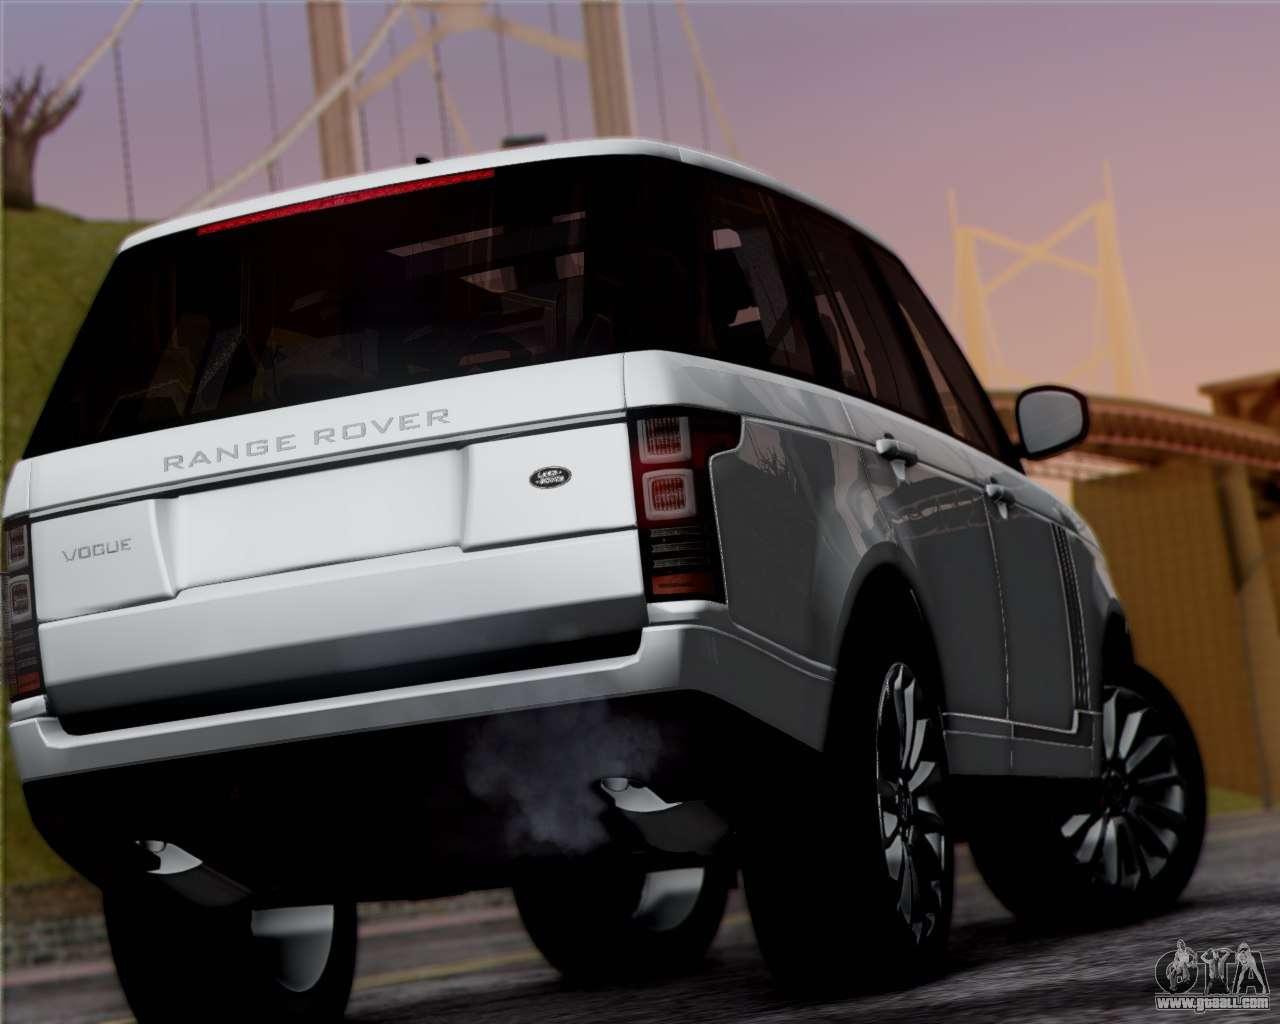 Grand Theft Auto: San Andreas Patch 101 gratuit